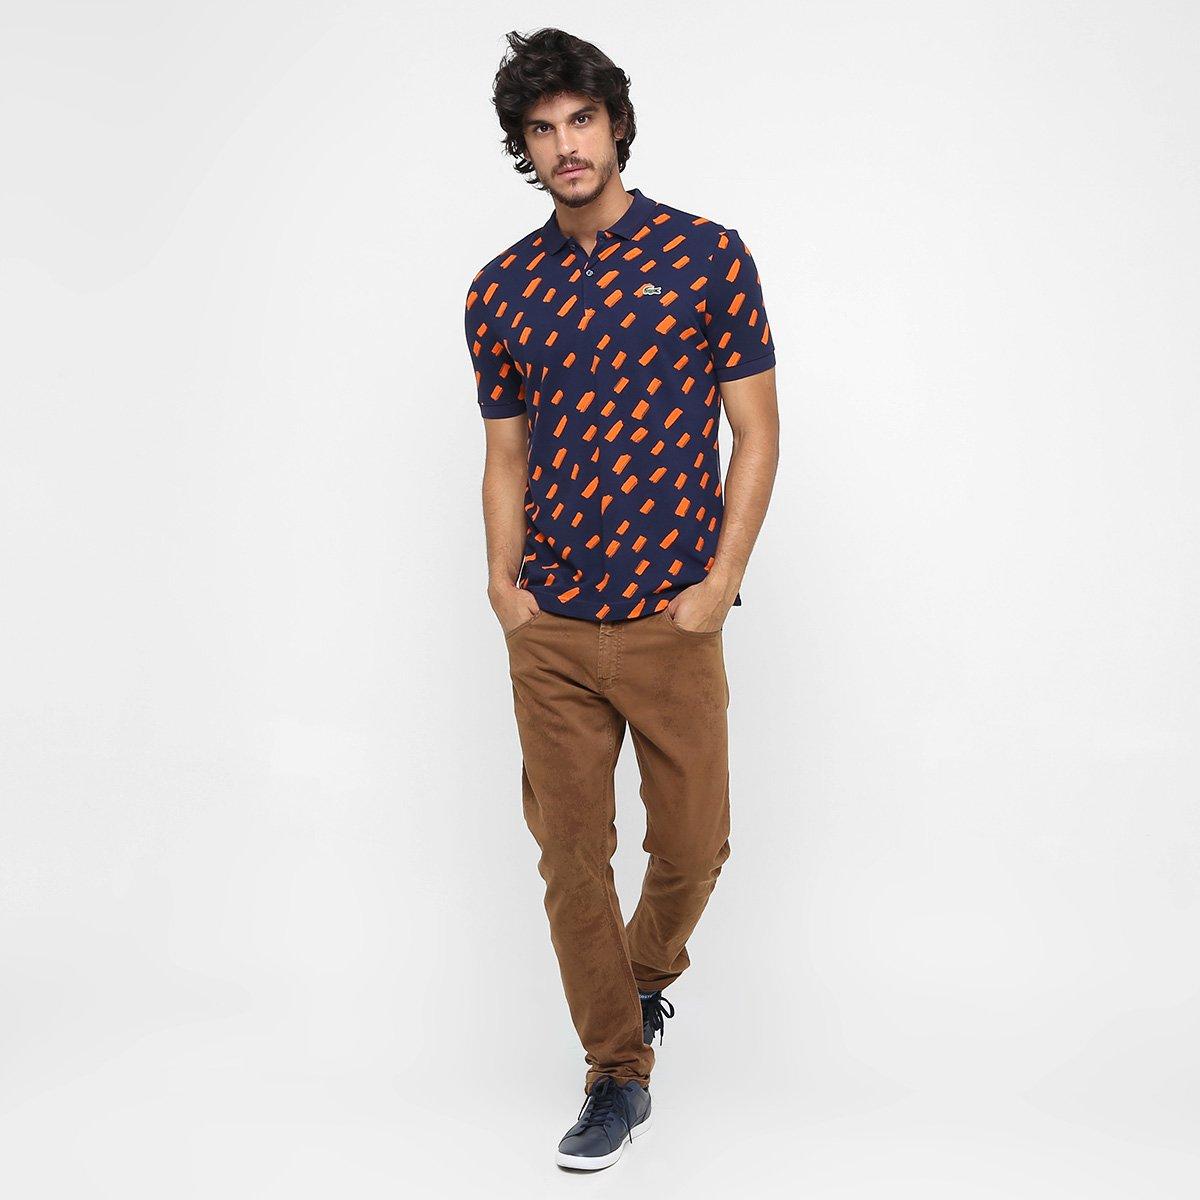 6153a62098adf Camisa Polo Lacoste Live Piquet Full Print - Compre Agora   Zattini